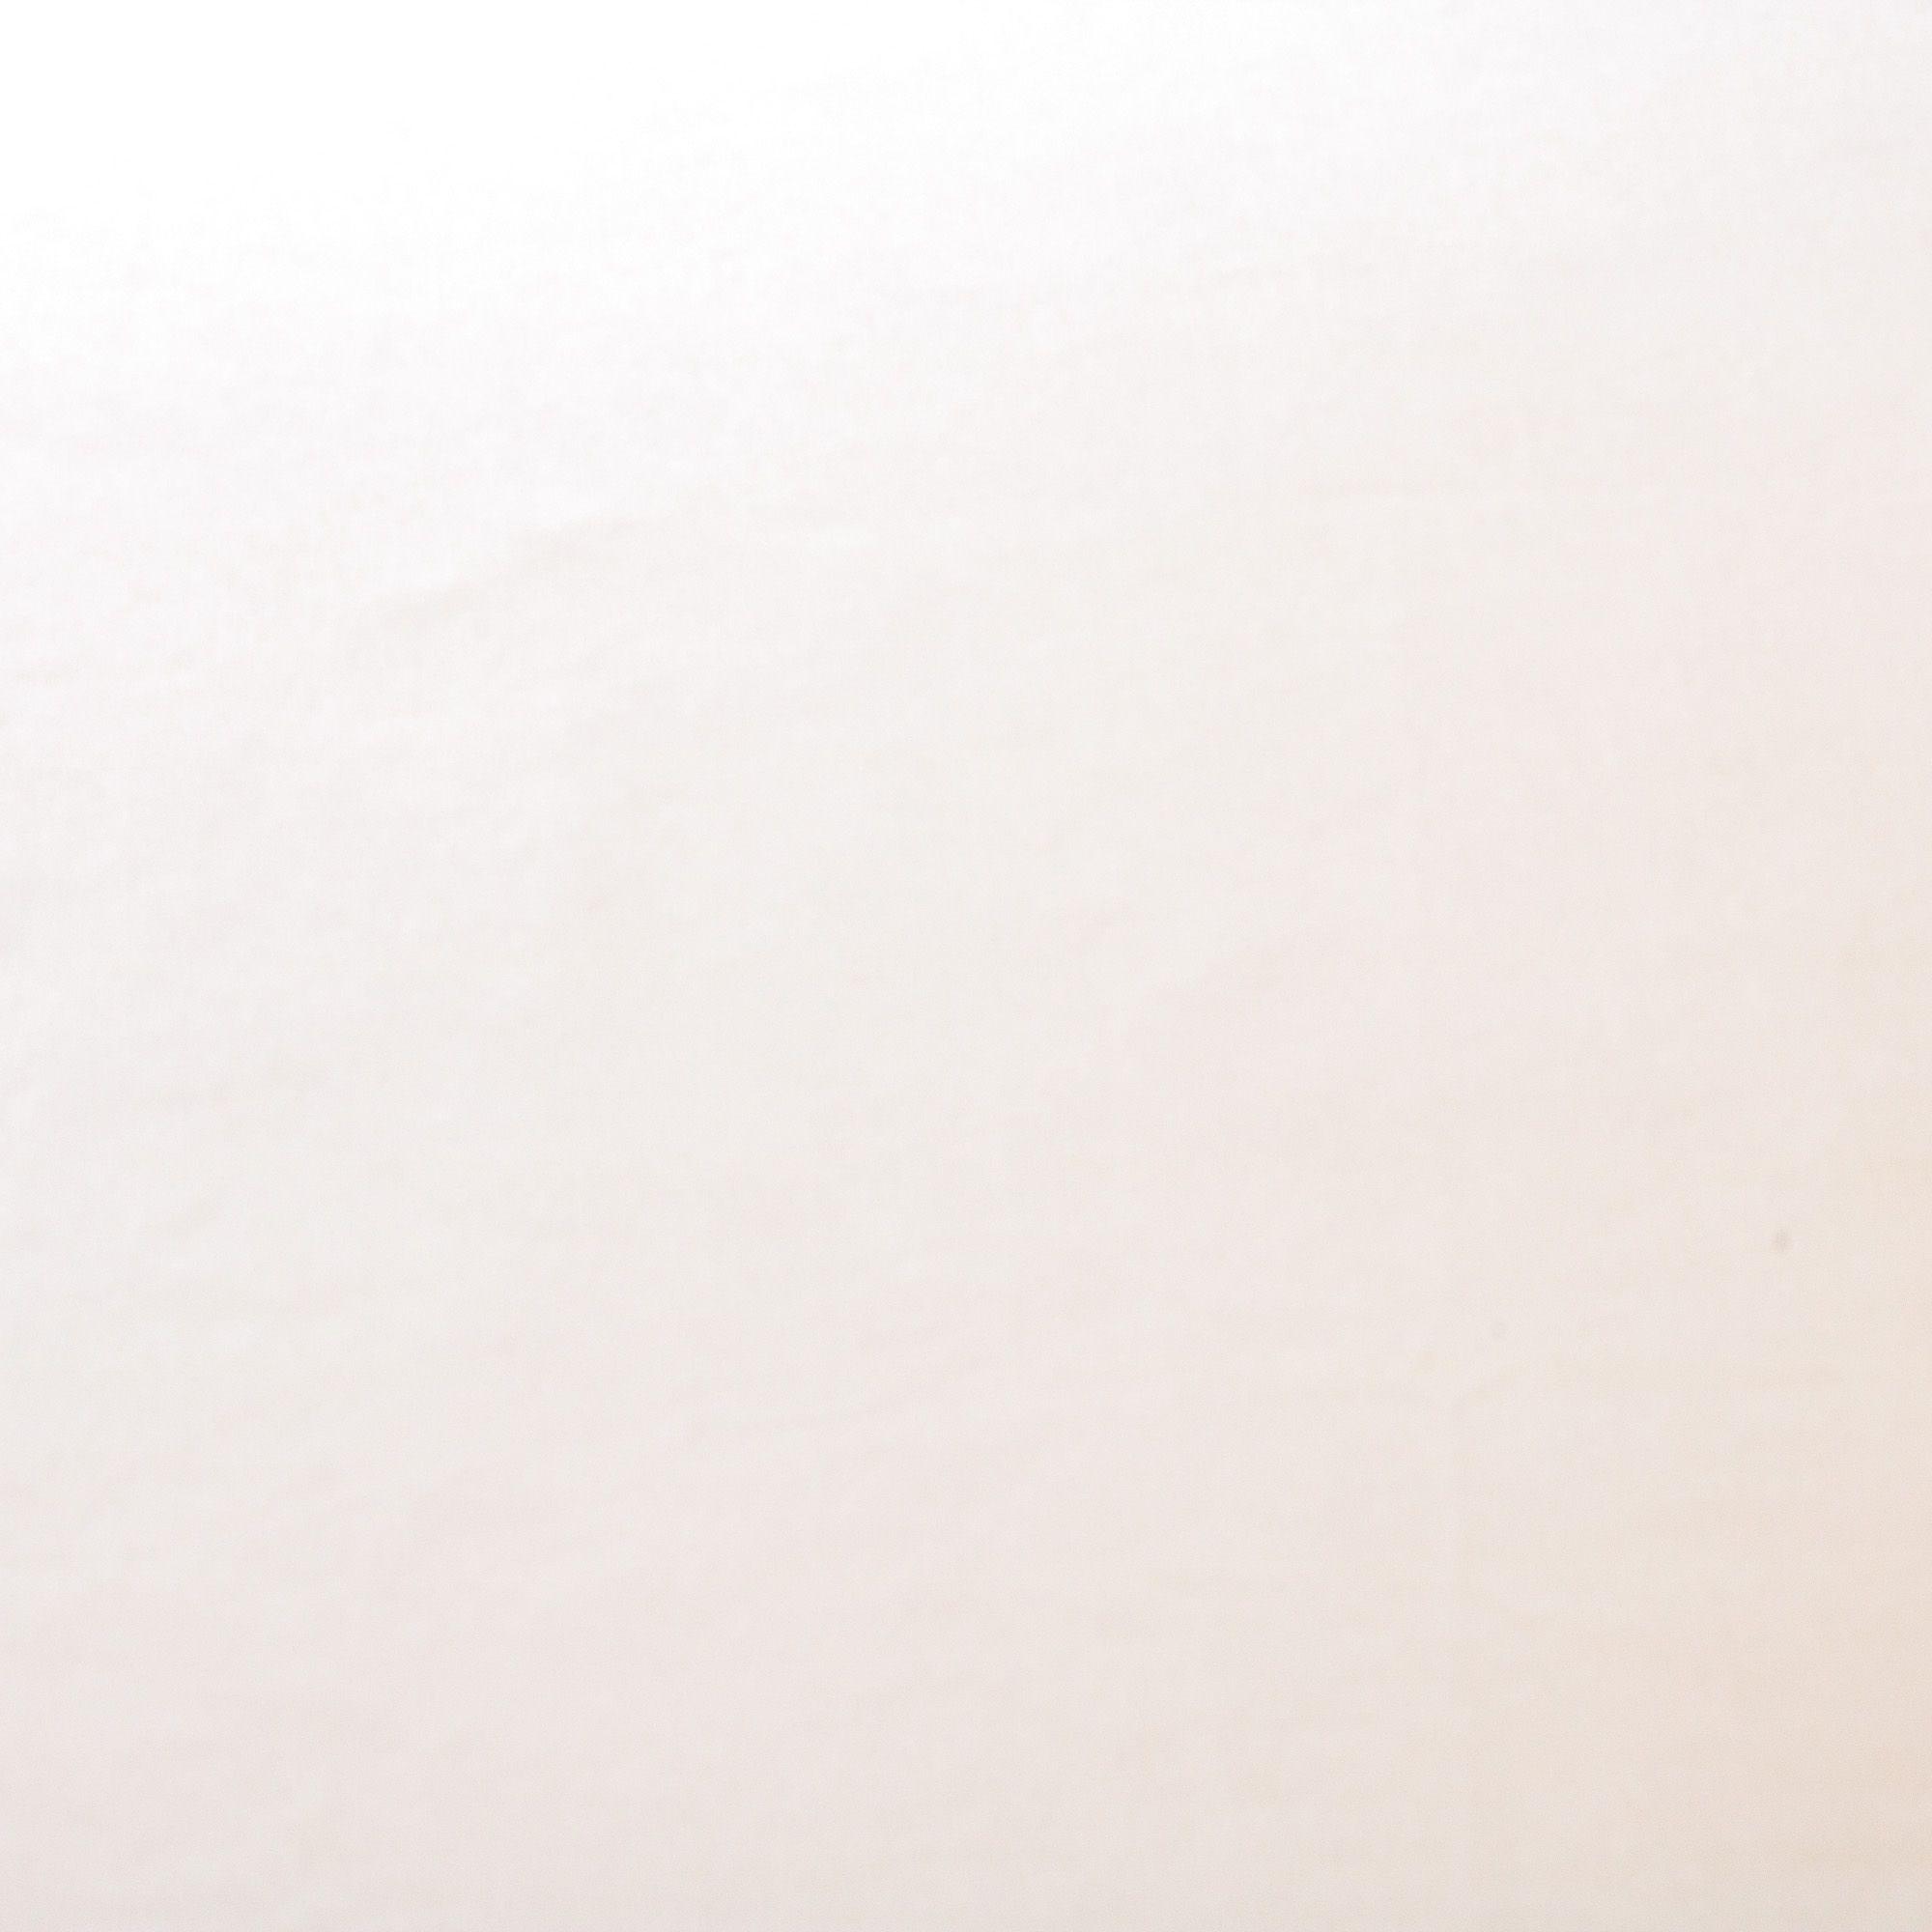 Tecido Malha Helanca Light Branca 100% Poliester 1,80 m Largura